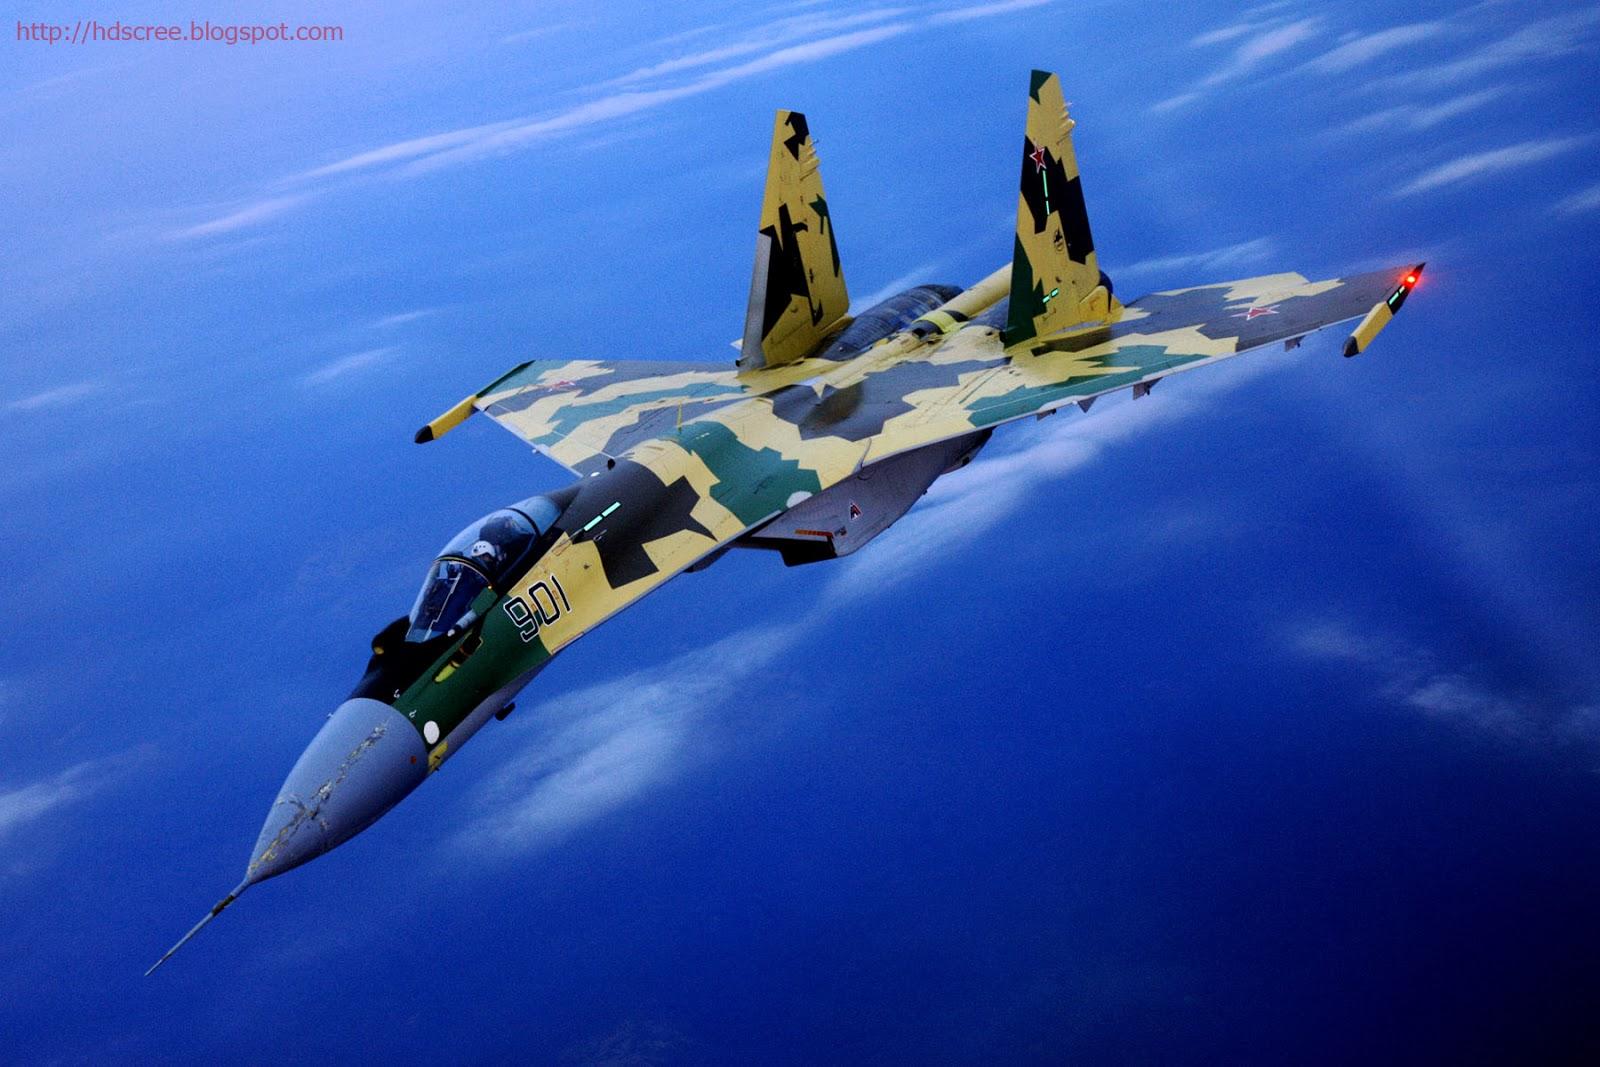 hd wallpaper of fighter aircraft   hd wallpaper   hd screensaver